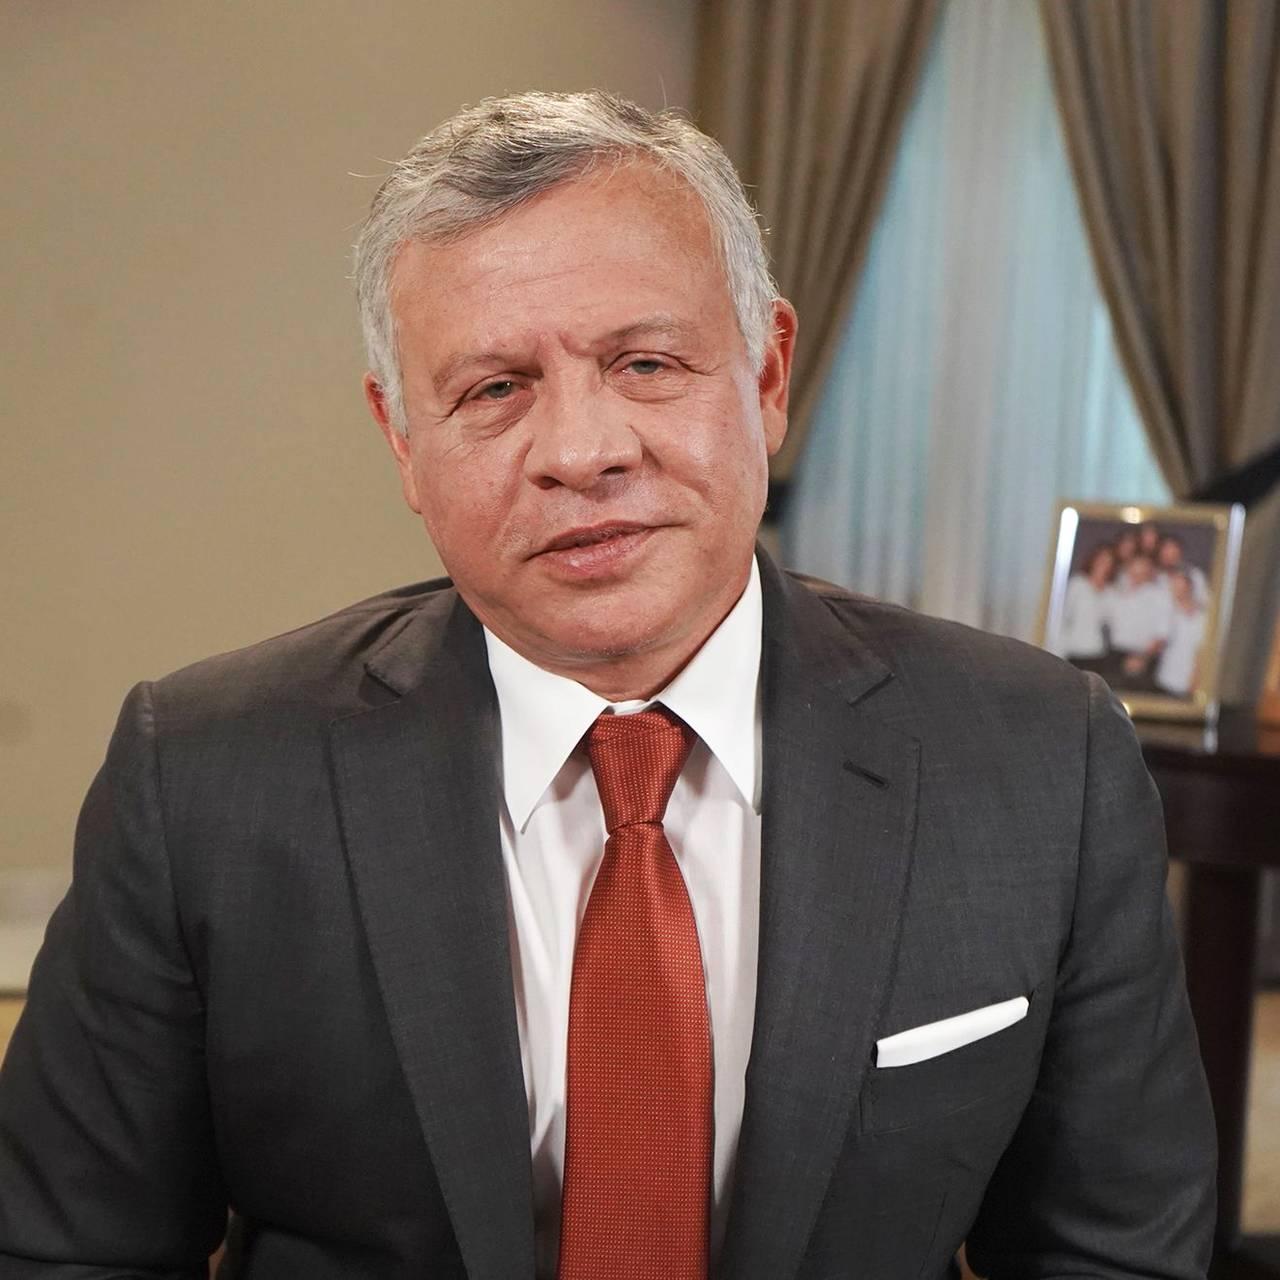 Bilde av Jordan: Kong Abdullah II